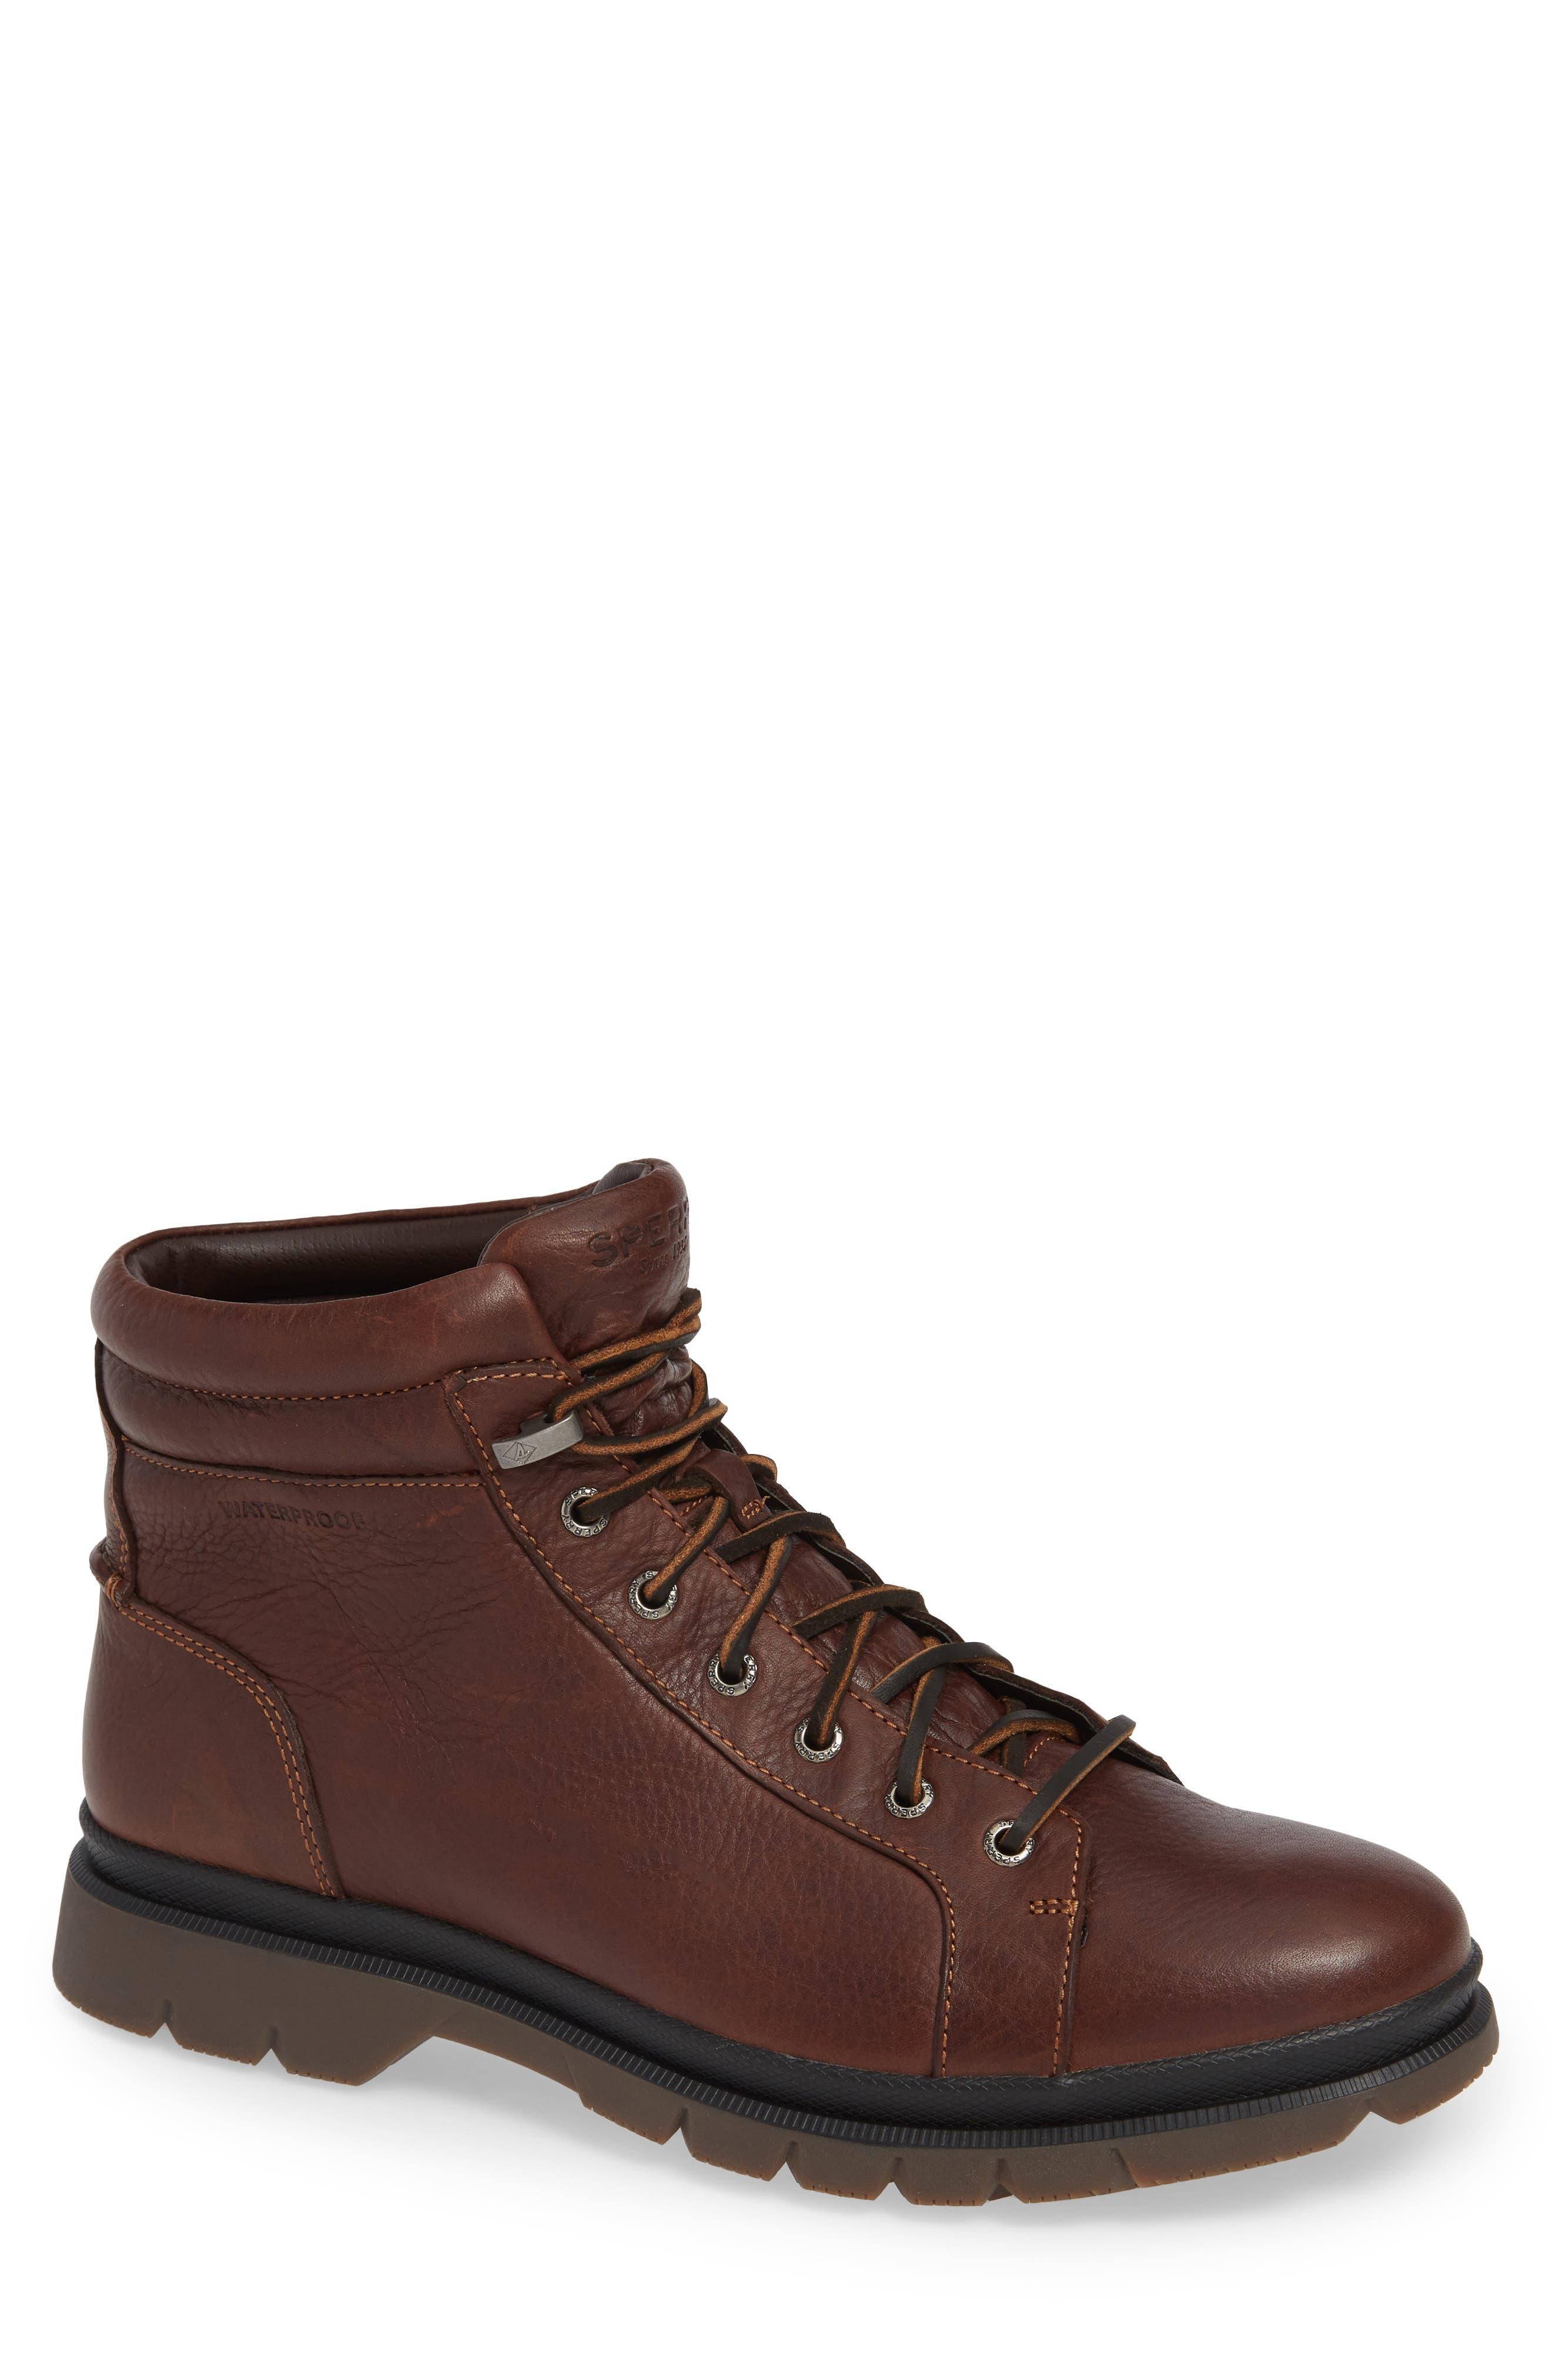 SPERRY Watertown Waterproof Plain Toe Boot, Main, color, DARK BROWN